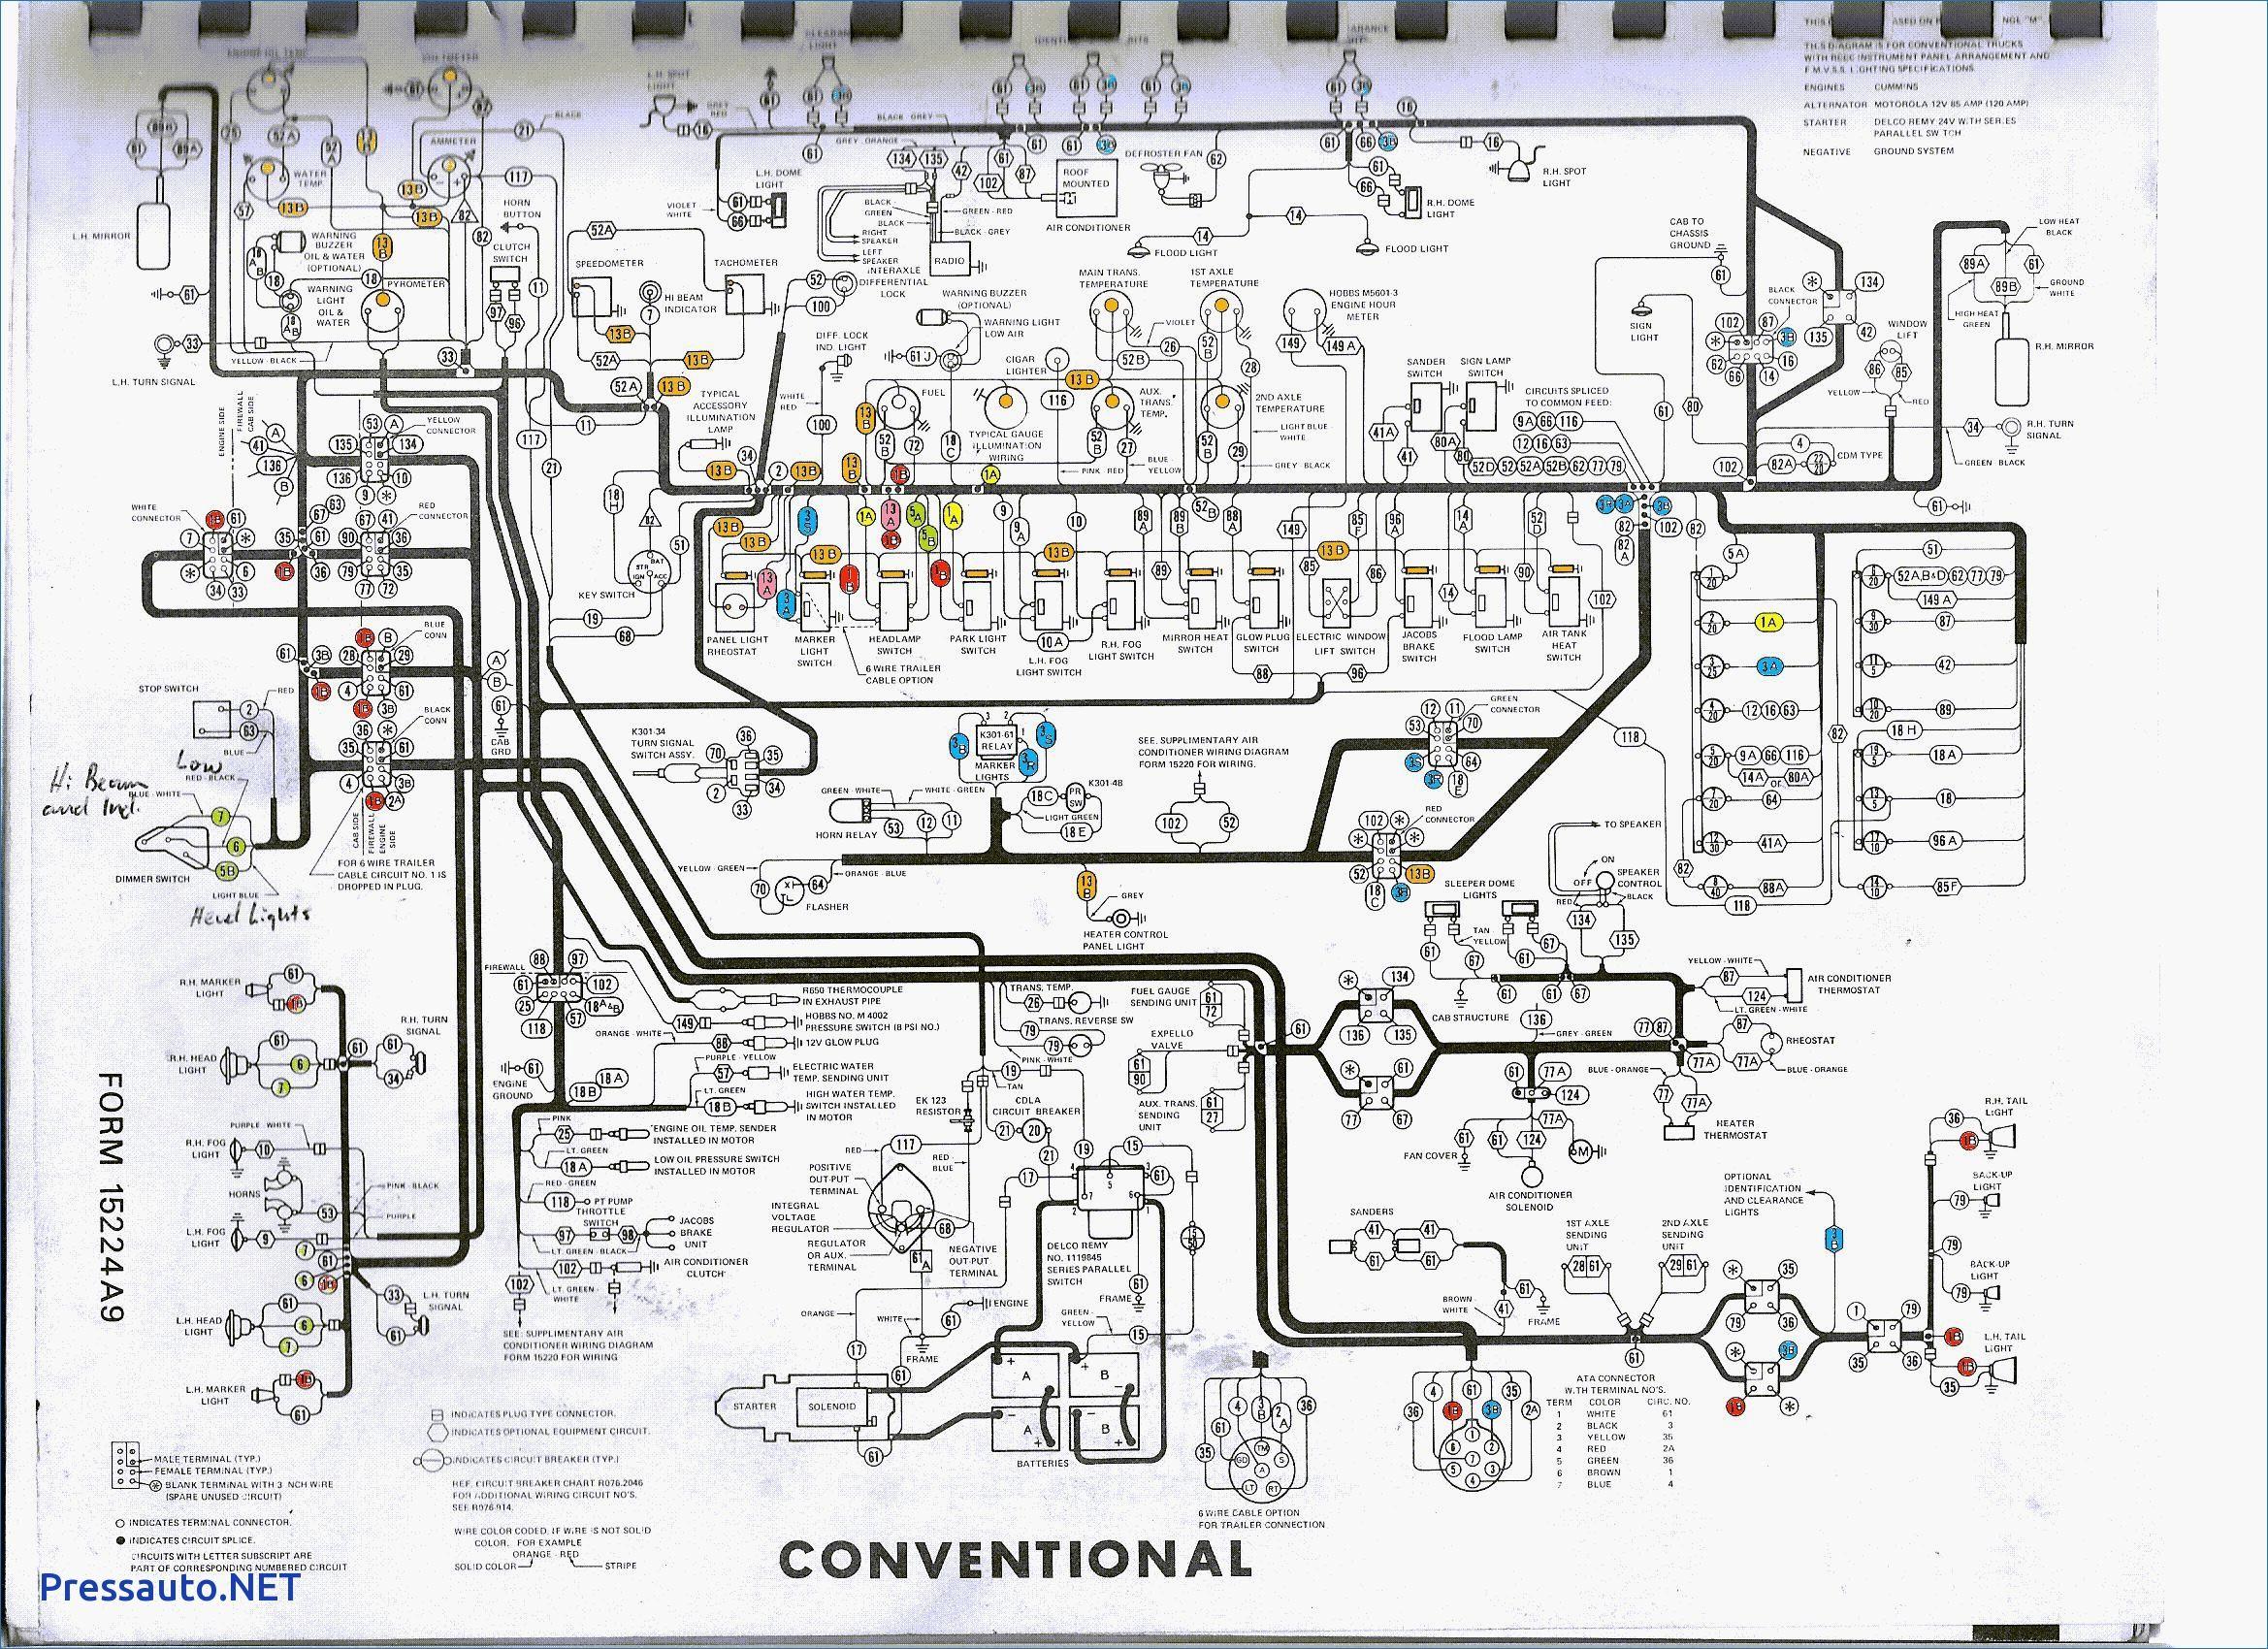 freightliner fld120 wiring diagram circuit diagram schematic freightliner starter diagram 1999 freightliner wiring diagram [ 2338 x 1700 Pixel ]